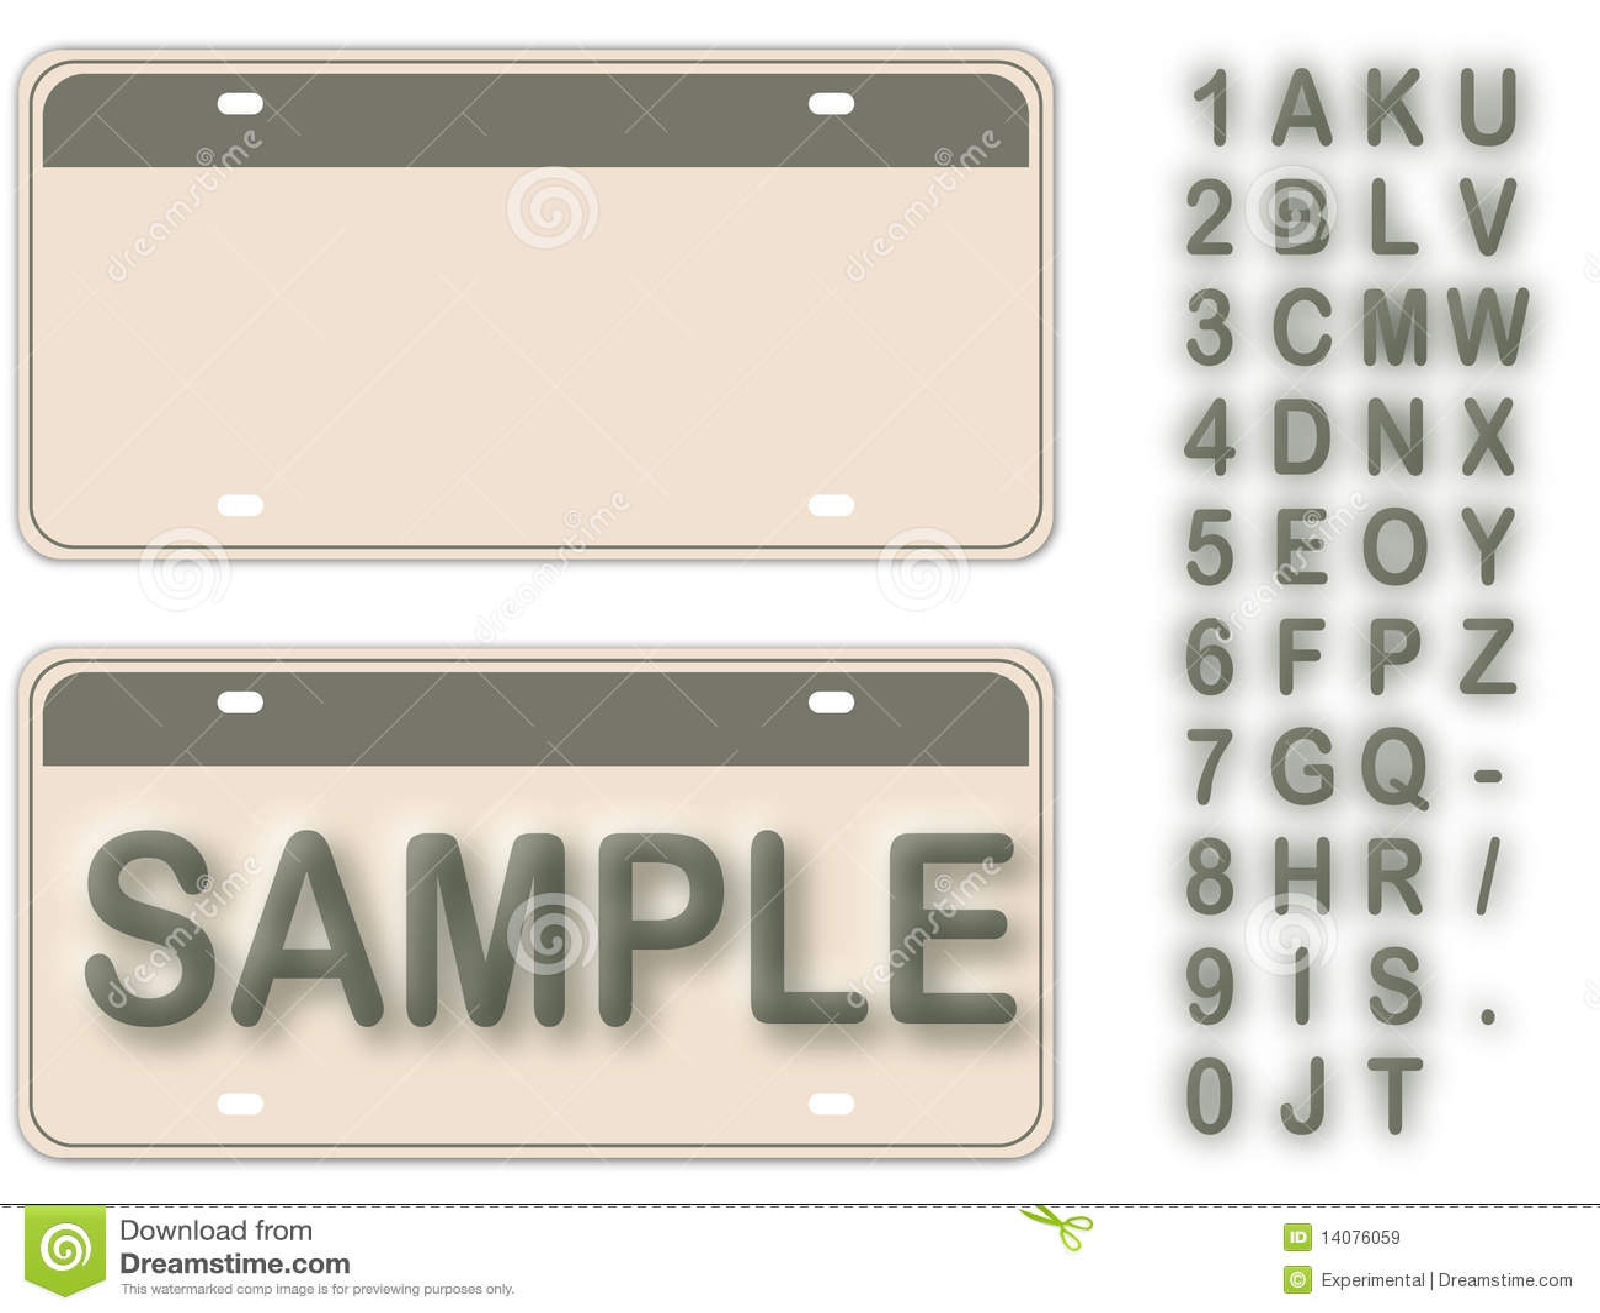 Empty License Plate